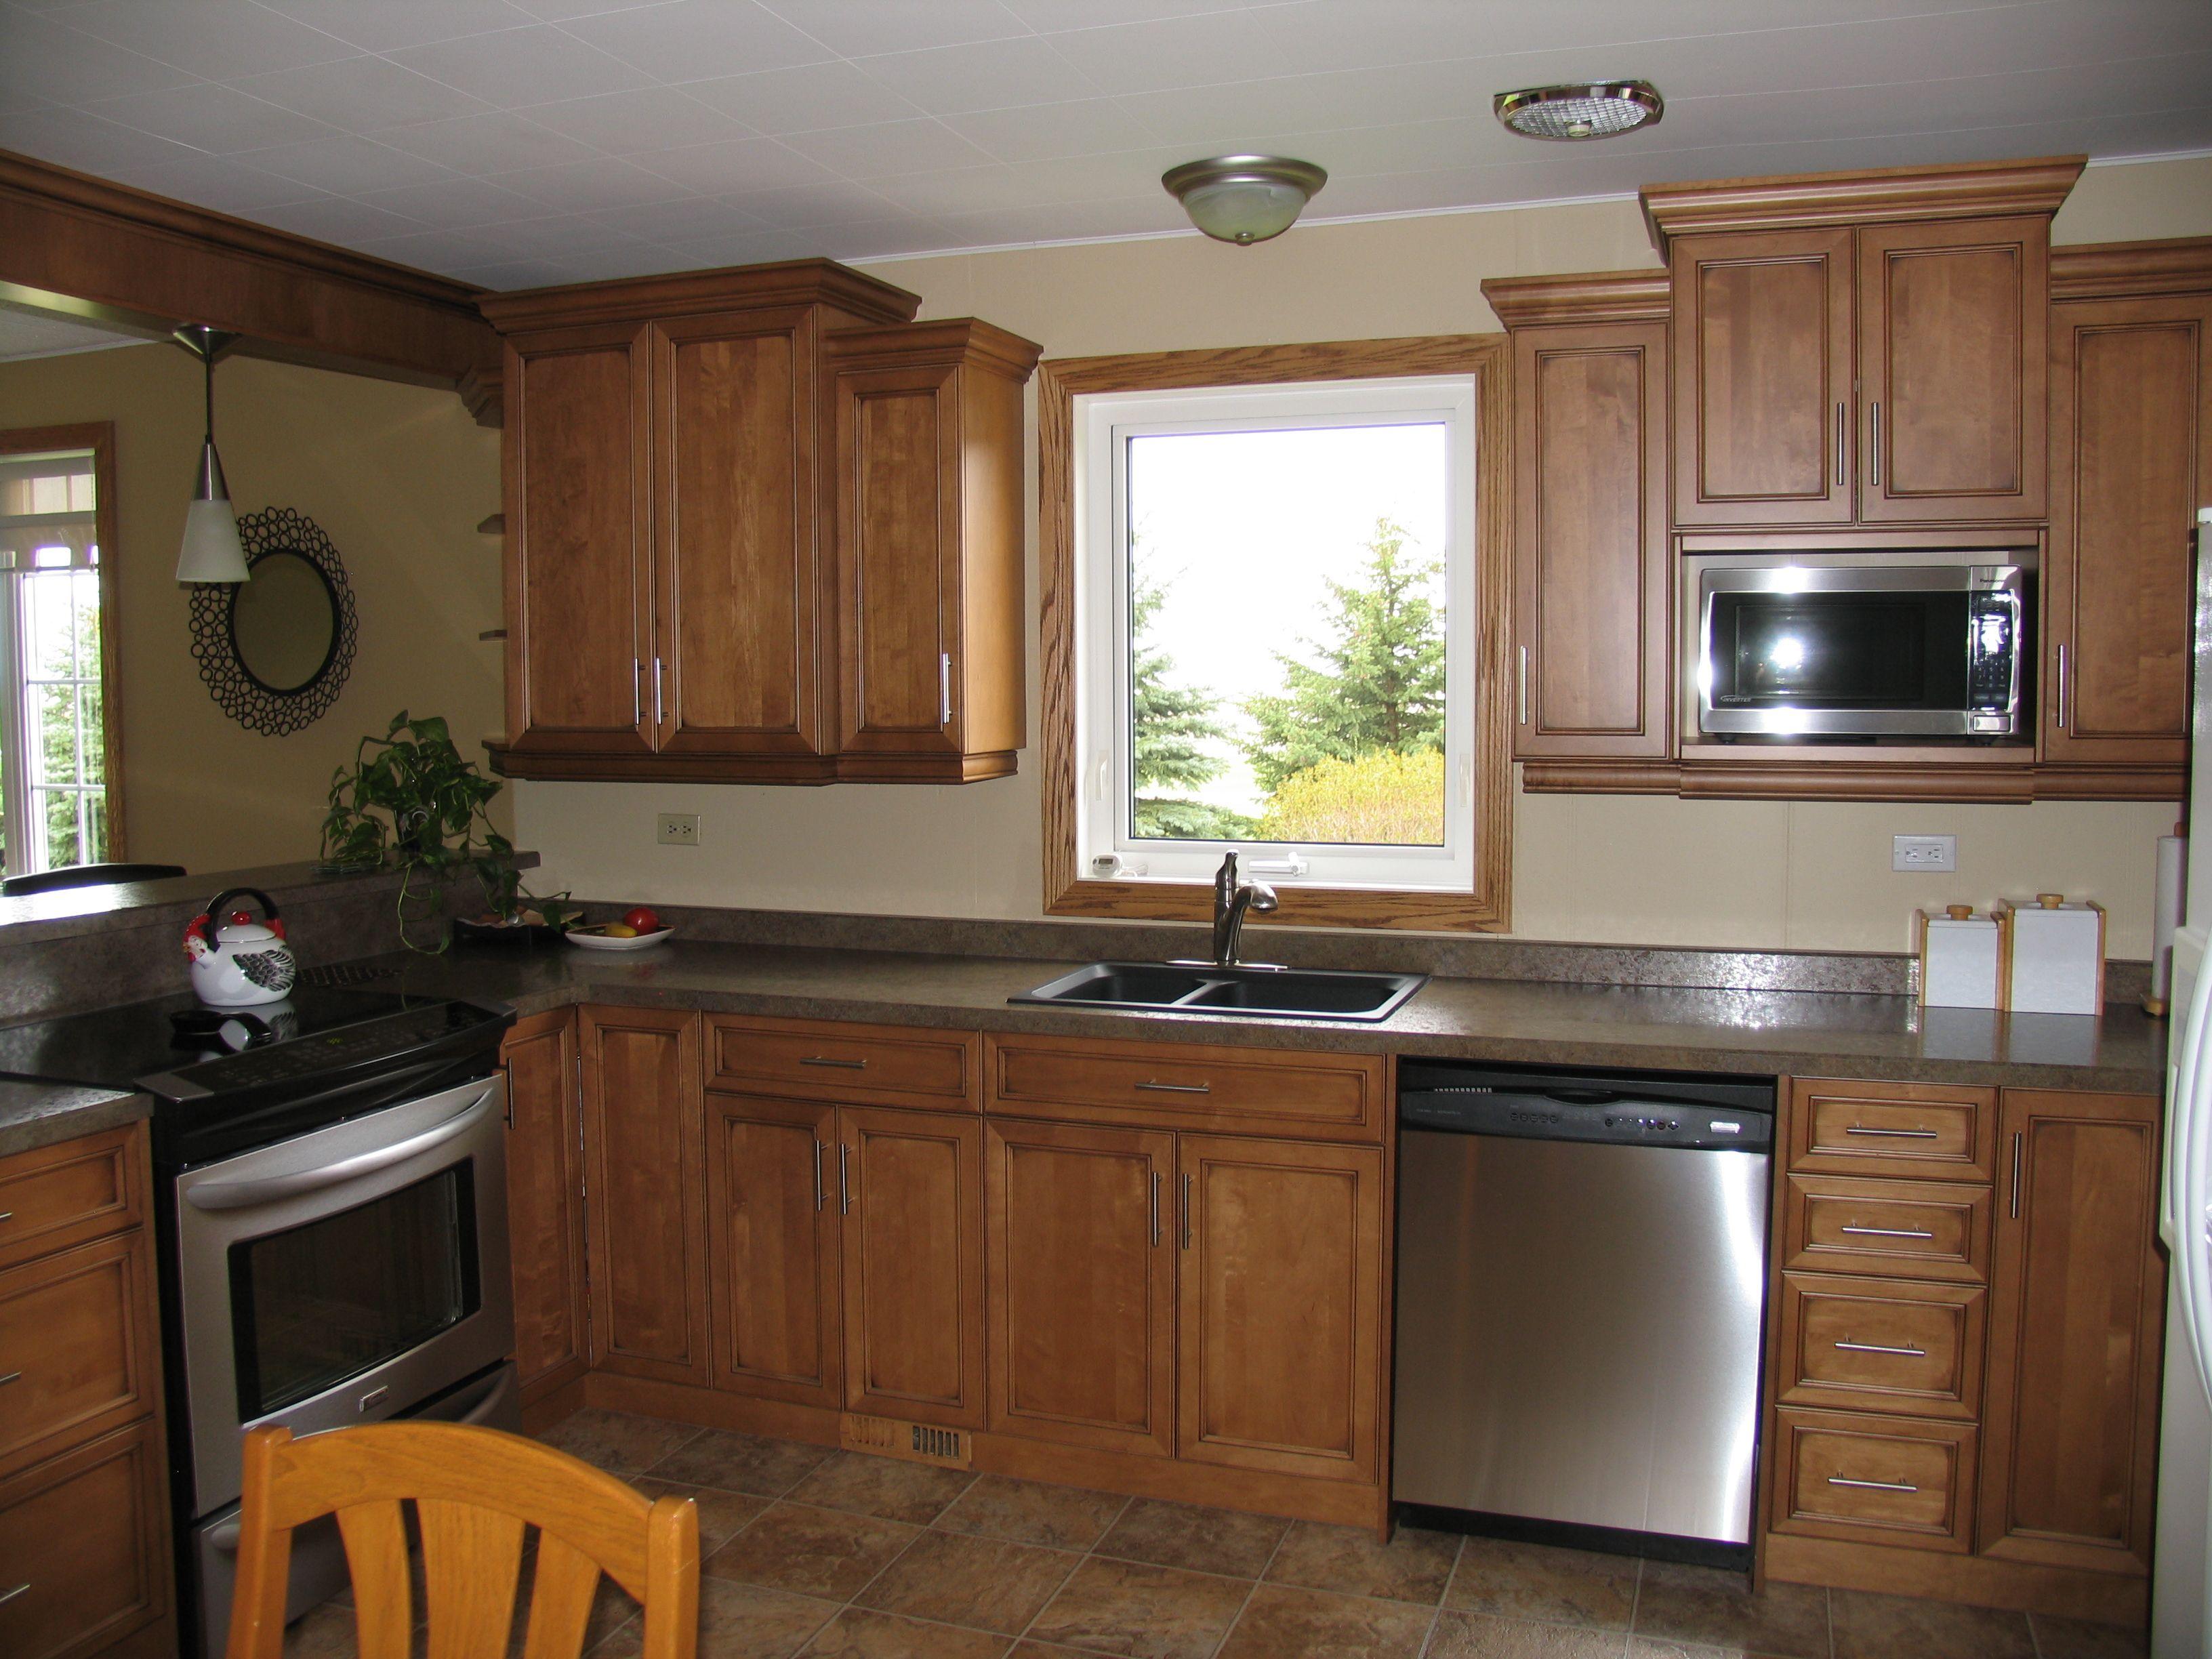 Wilsonart Laminate Kitchen Countertops Cabinets Oak  Natural  Countertop Wilsonart Laminate  Milano